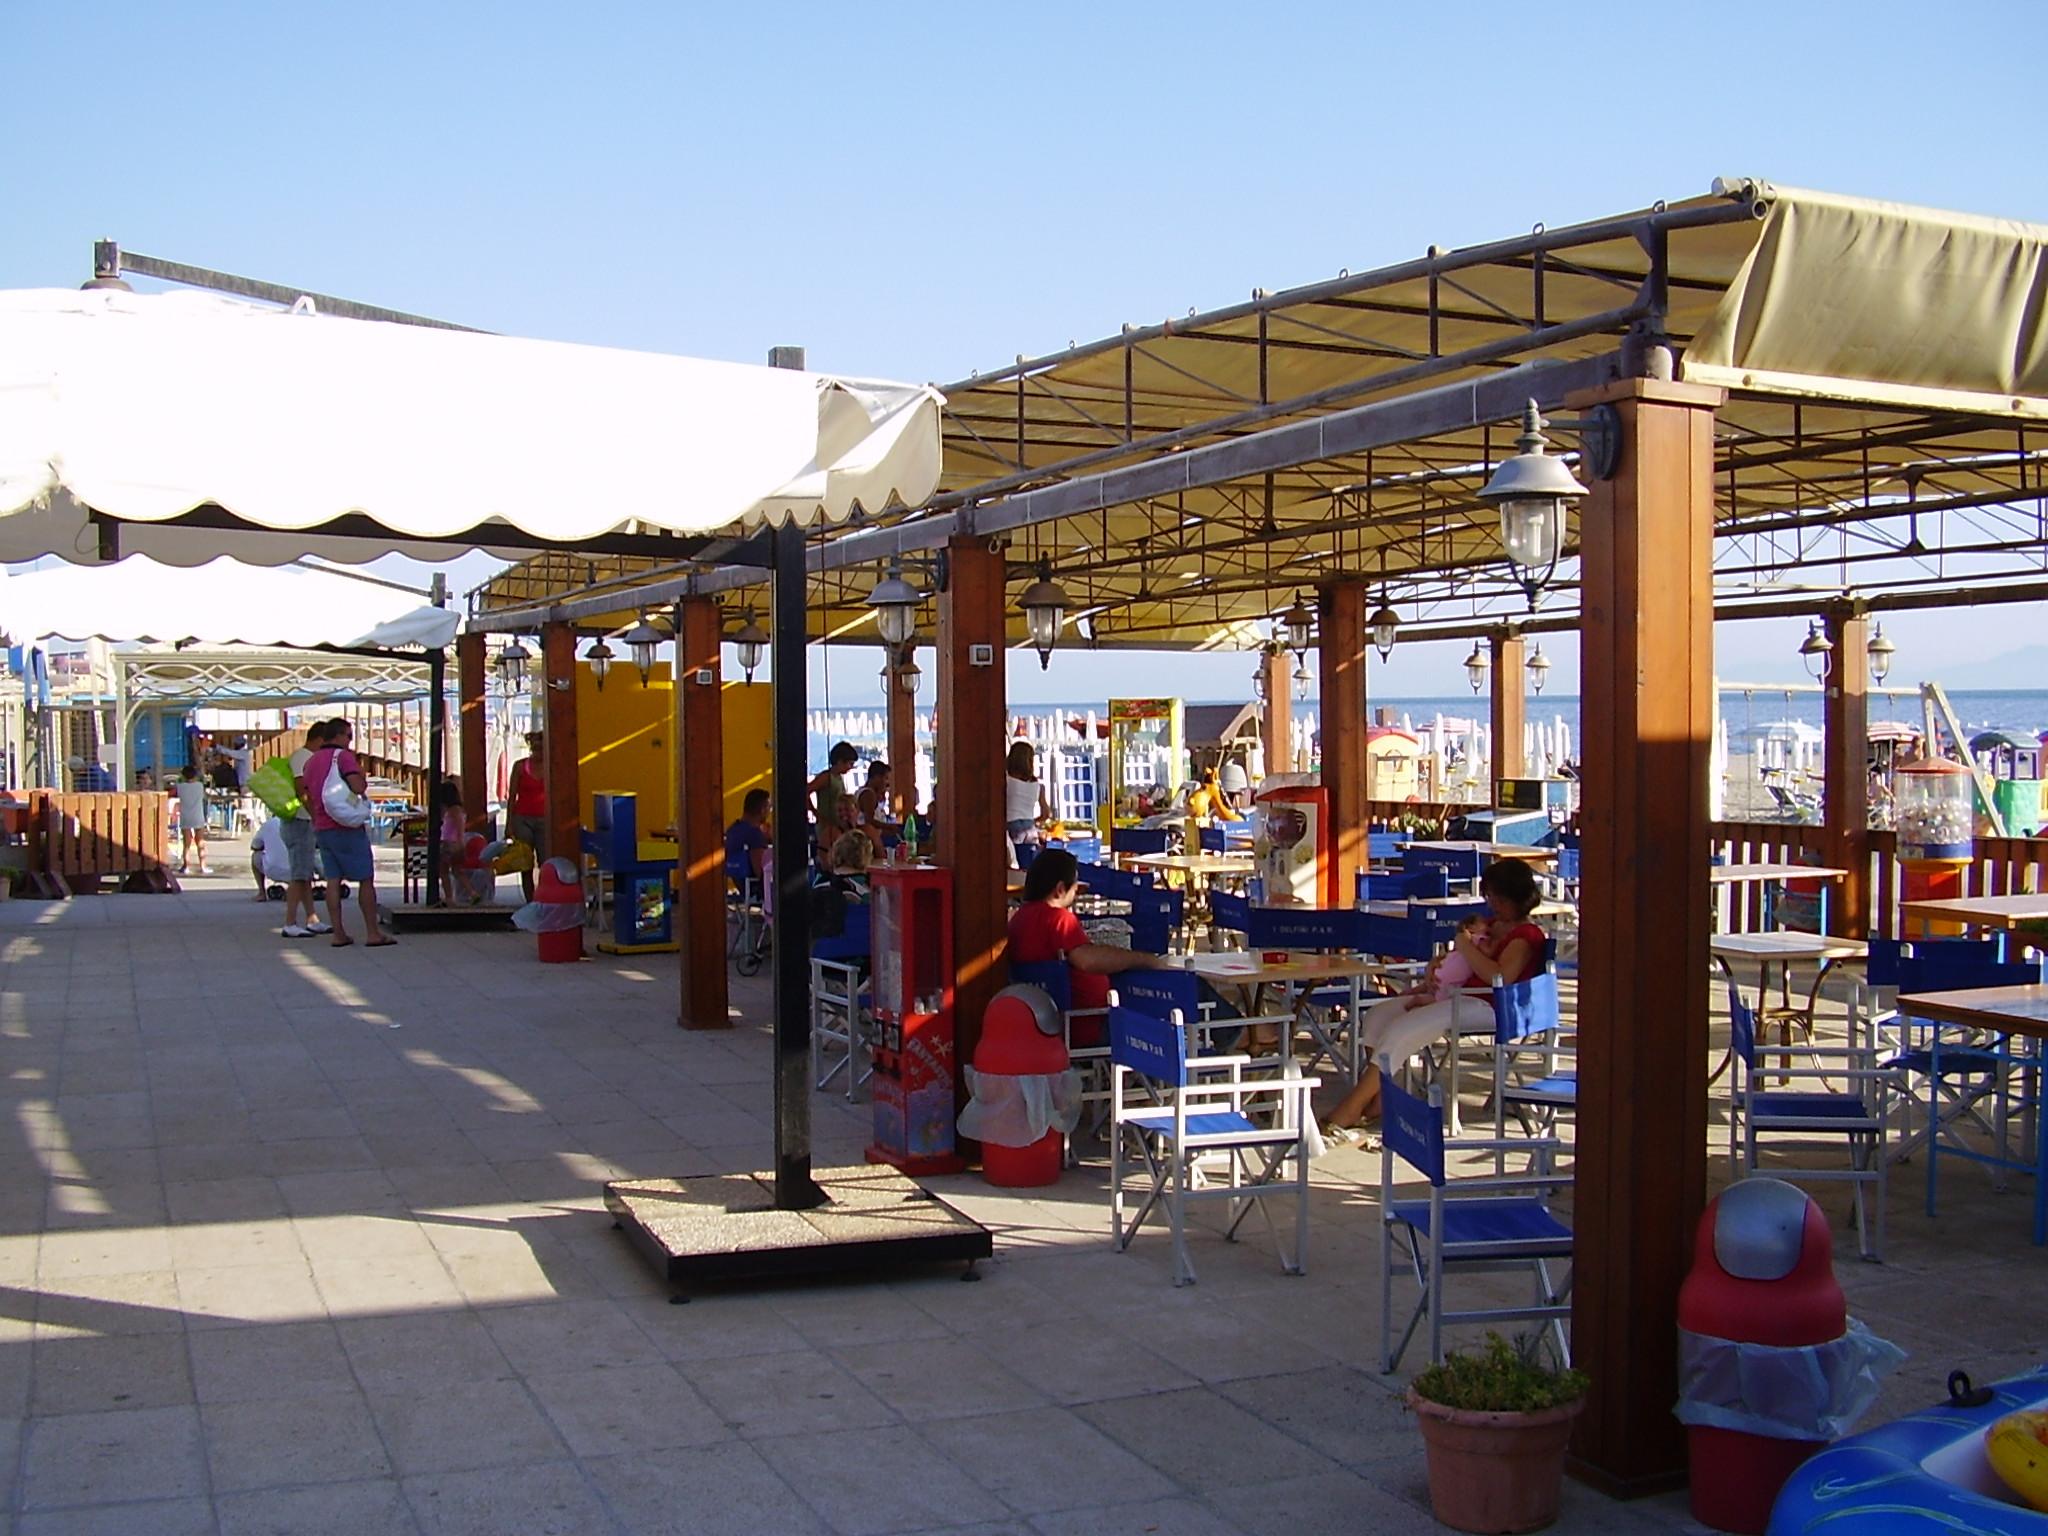 Gazebo bar